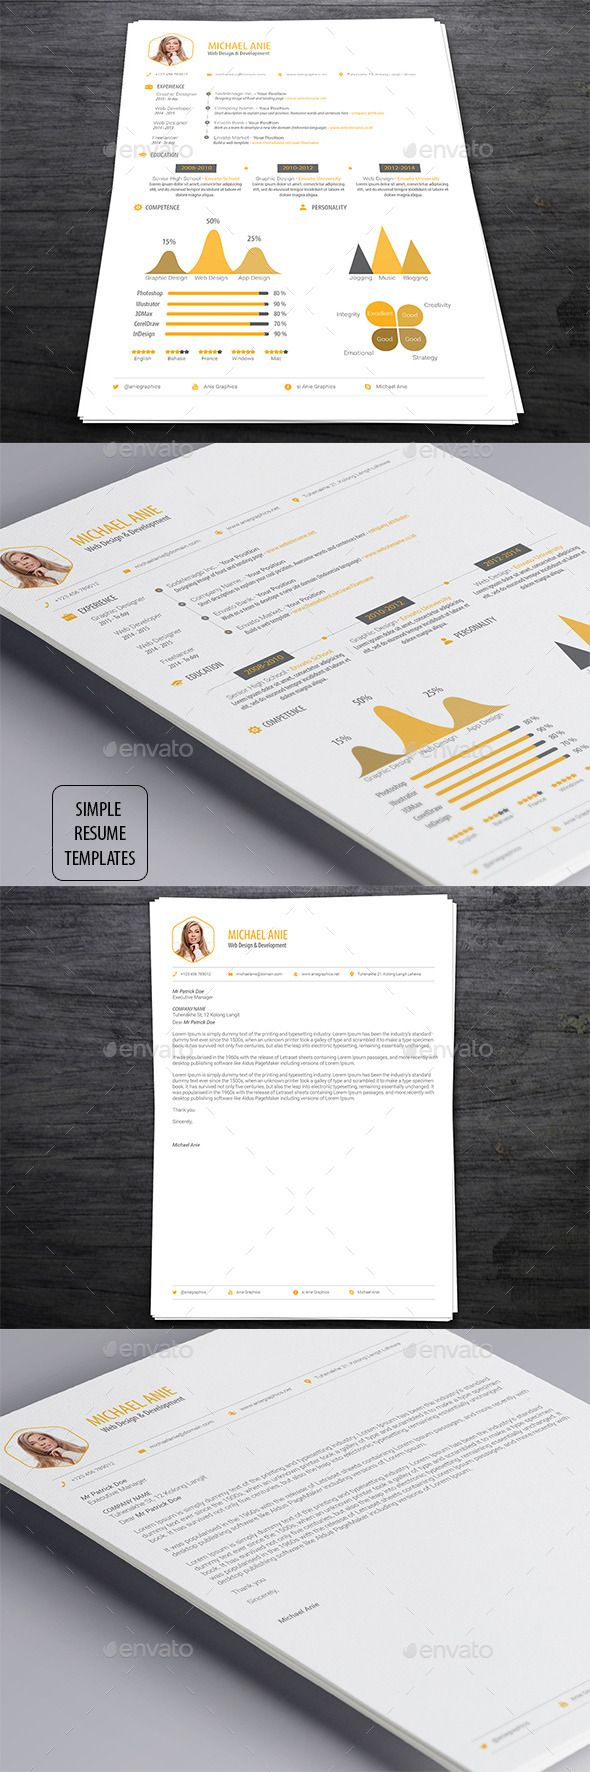 simple resume templates - Simple Resume Template